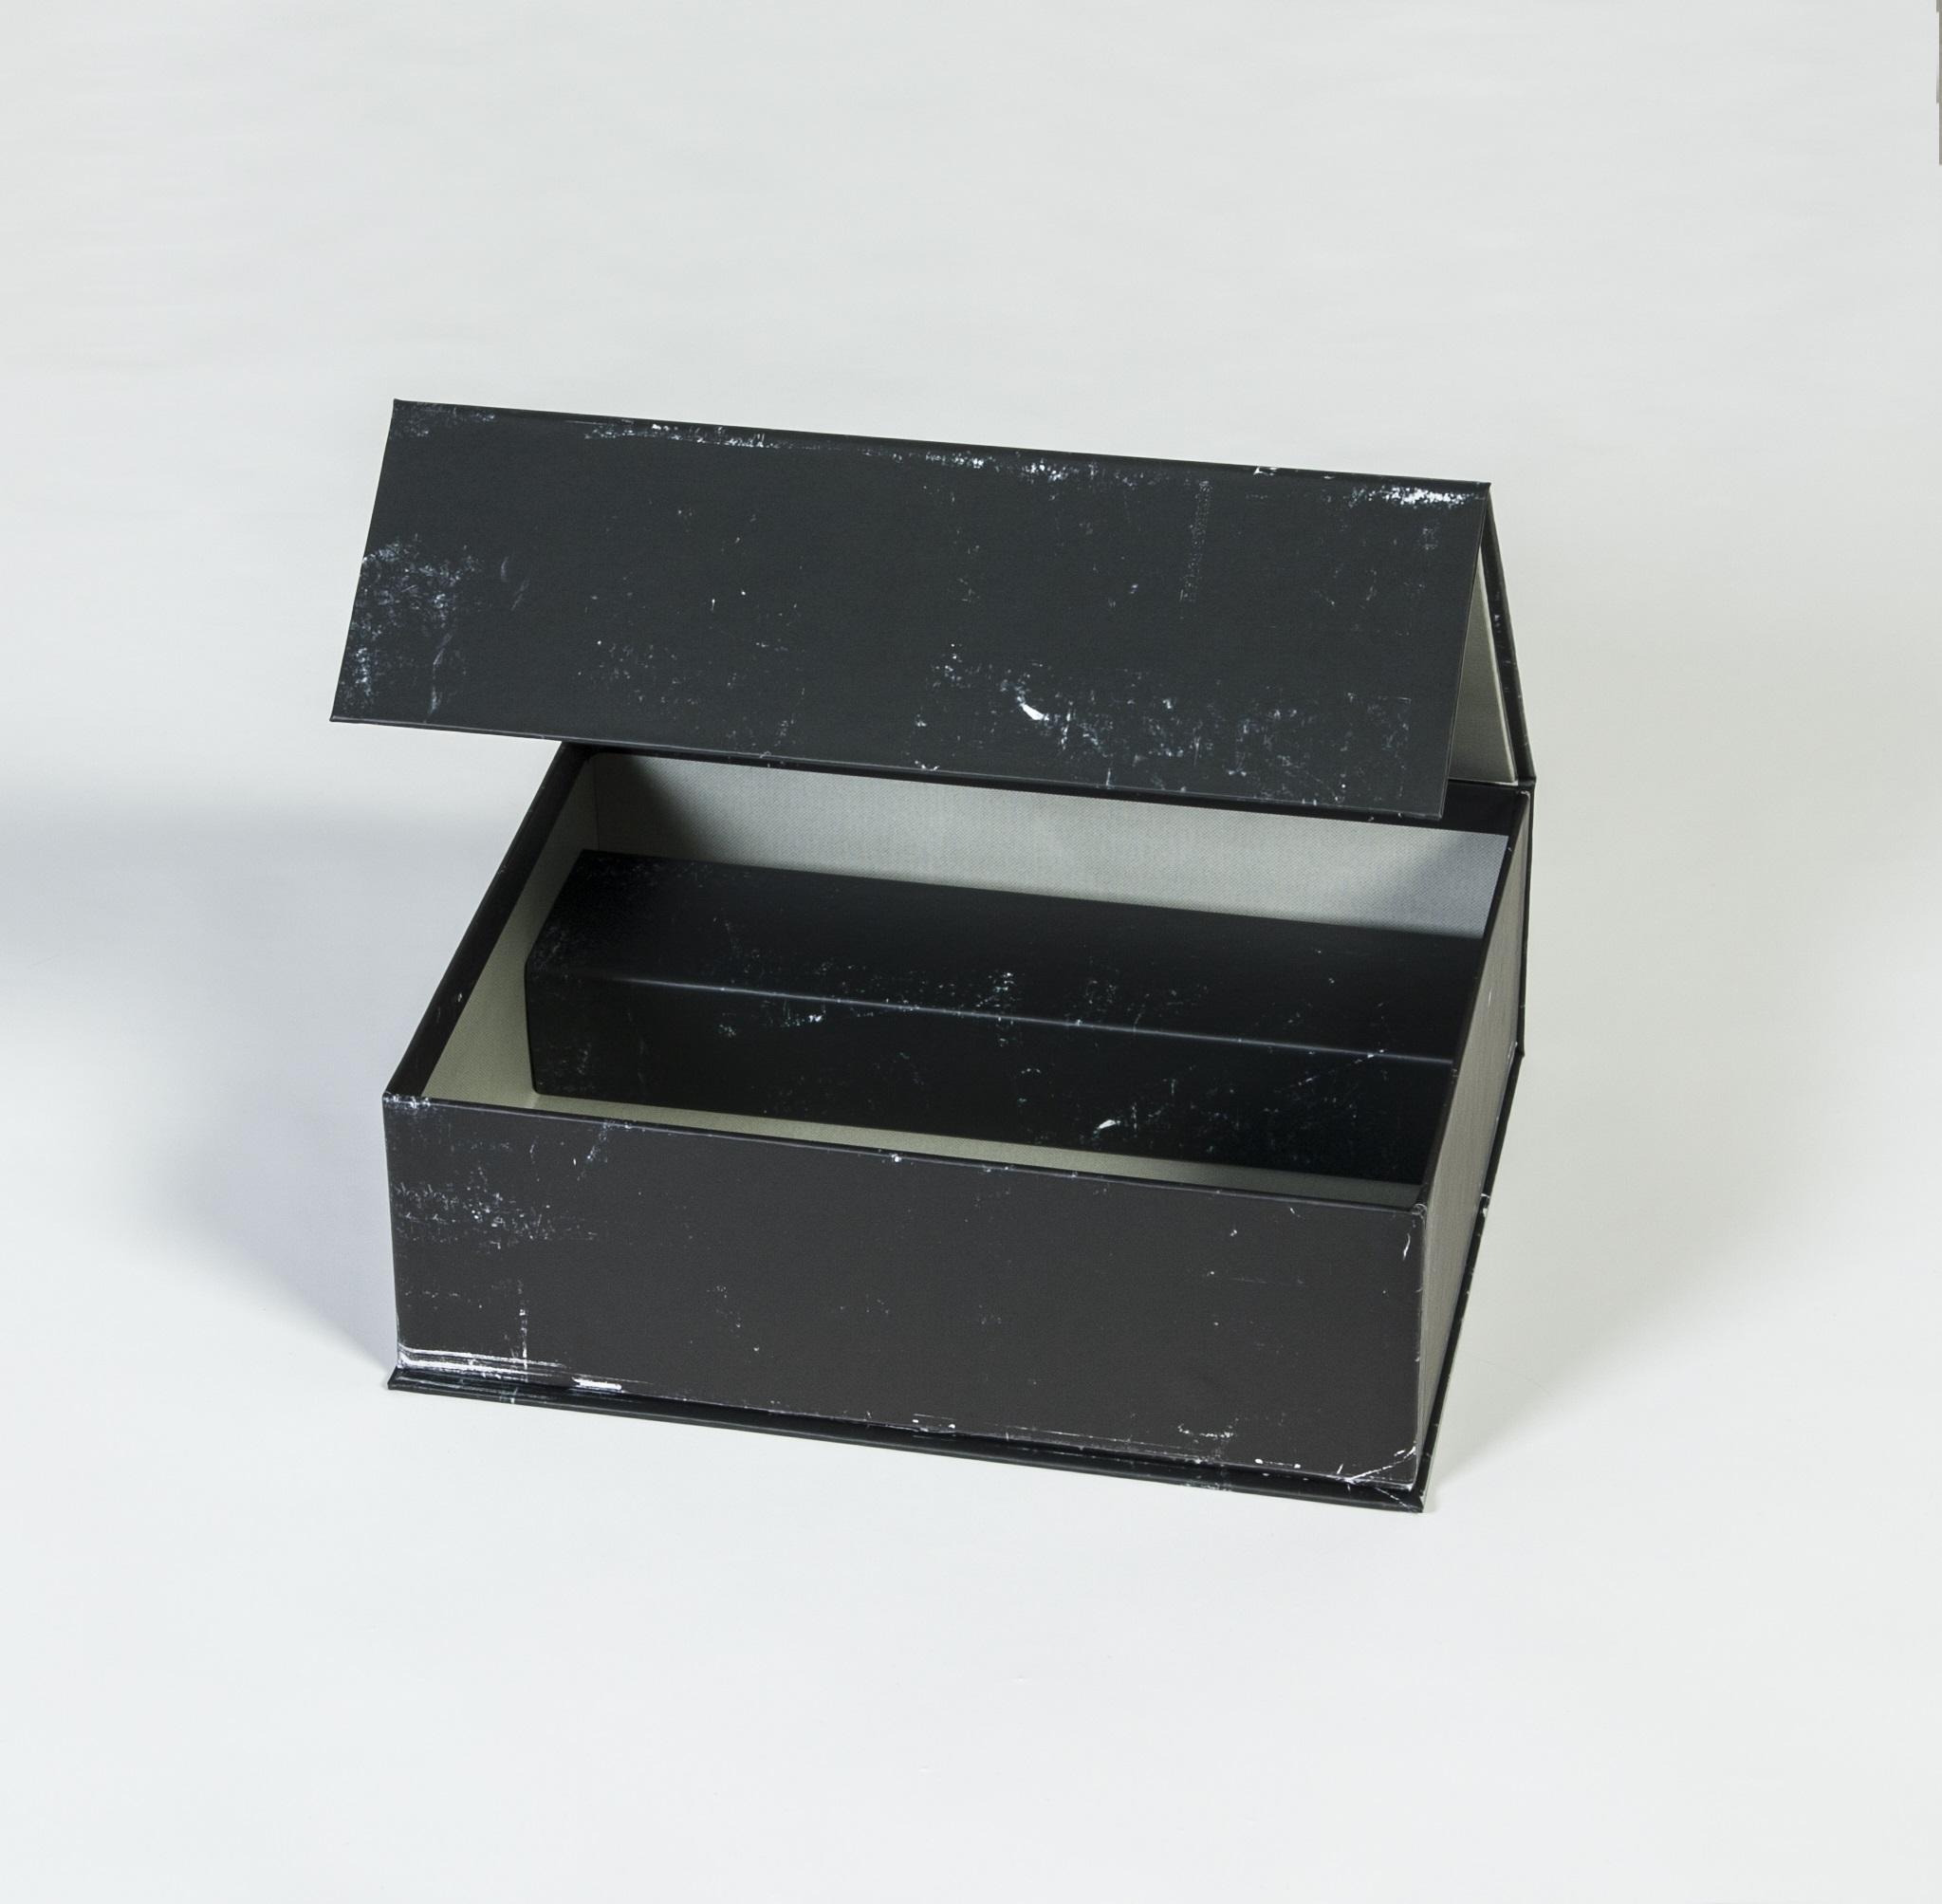 Winnipeg Jets Premium Suite Box - open